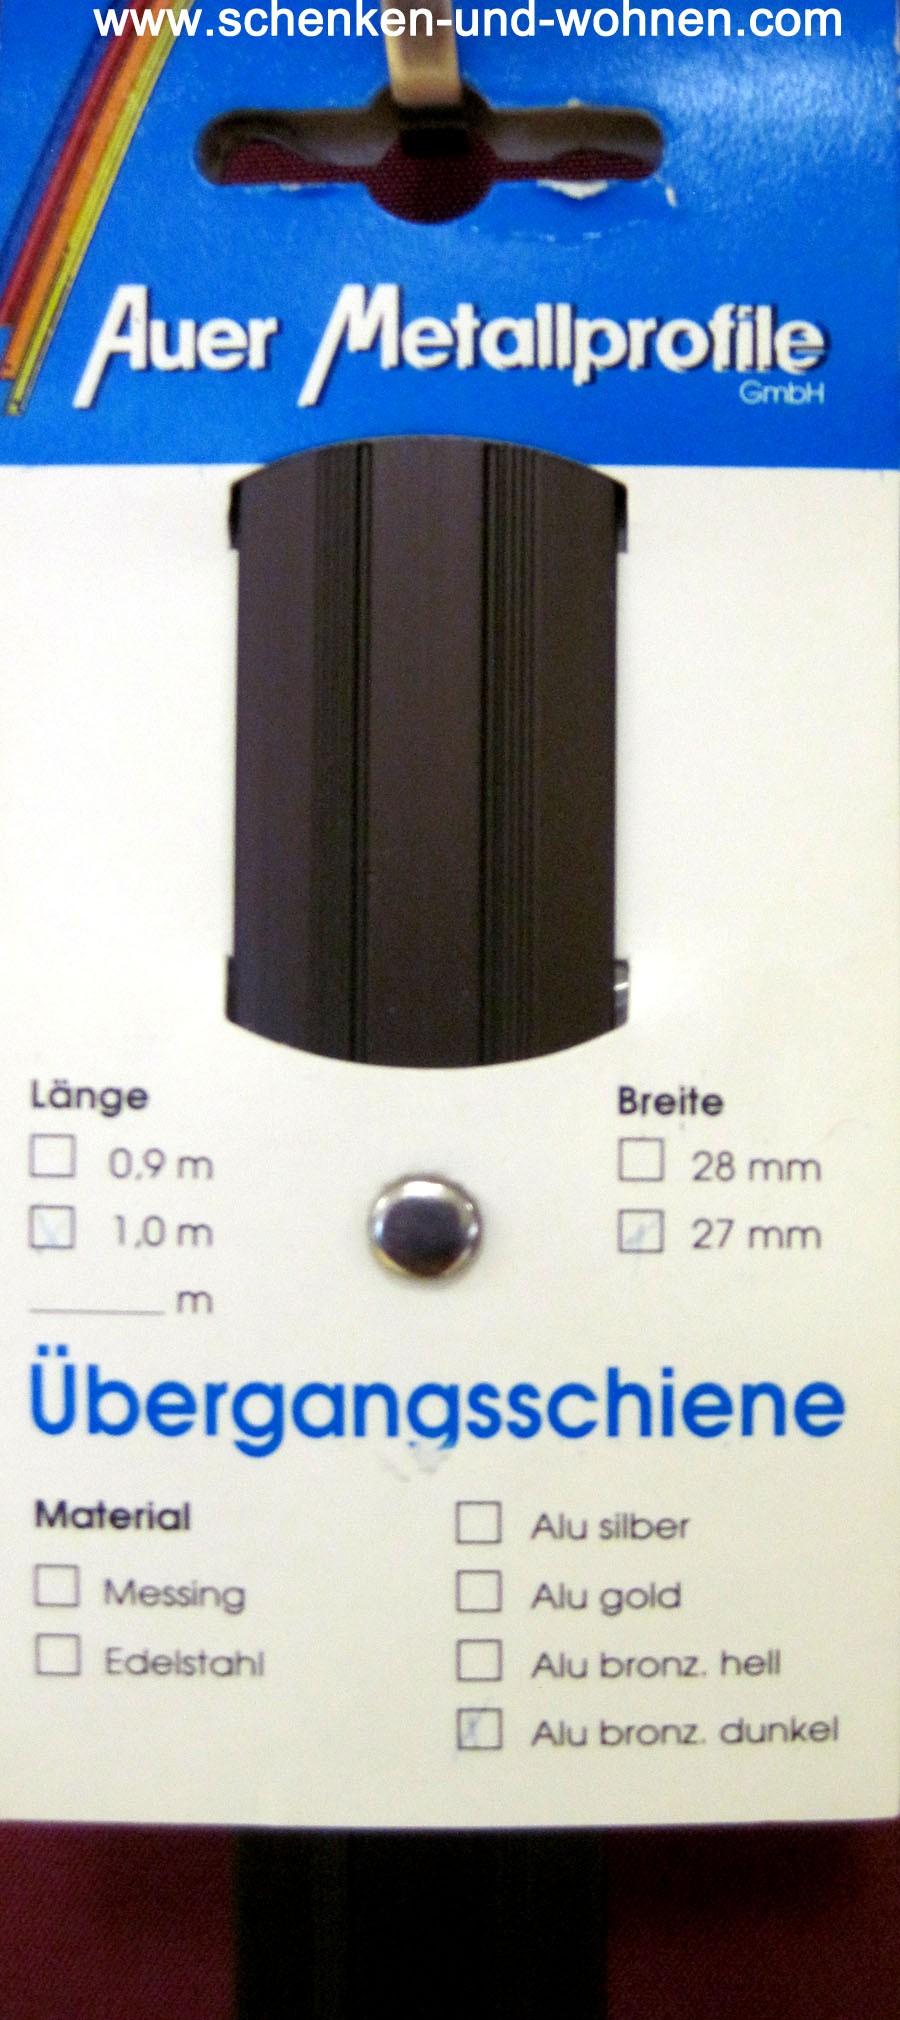 Übergangsprofil 27x1,7 mm 1,0 m bronze dunkel gebohrt